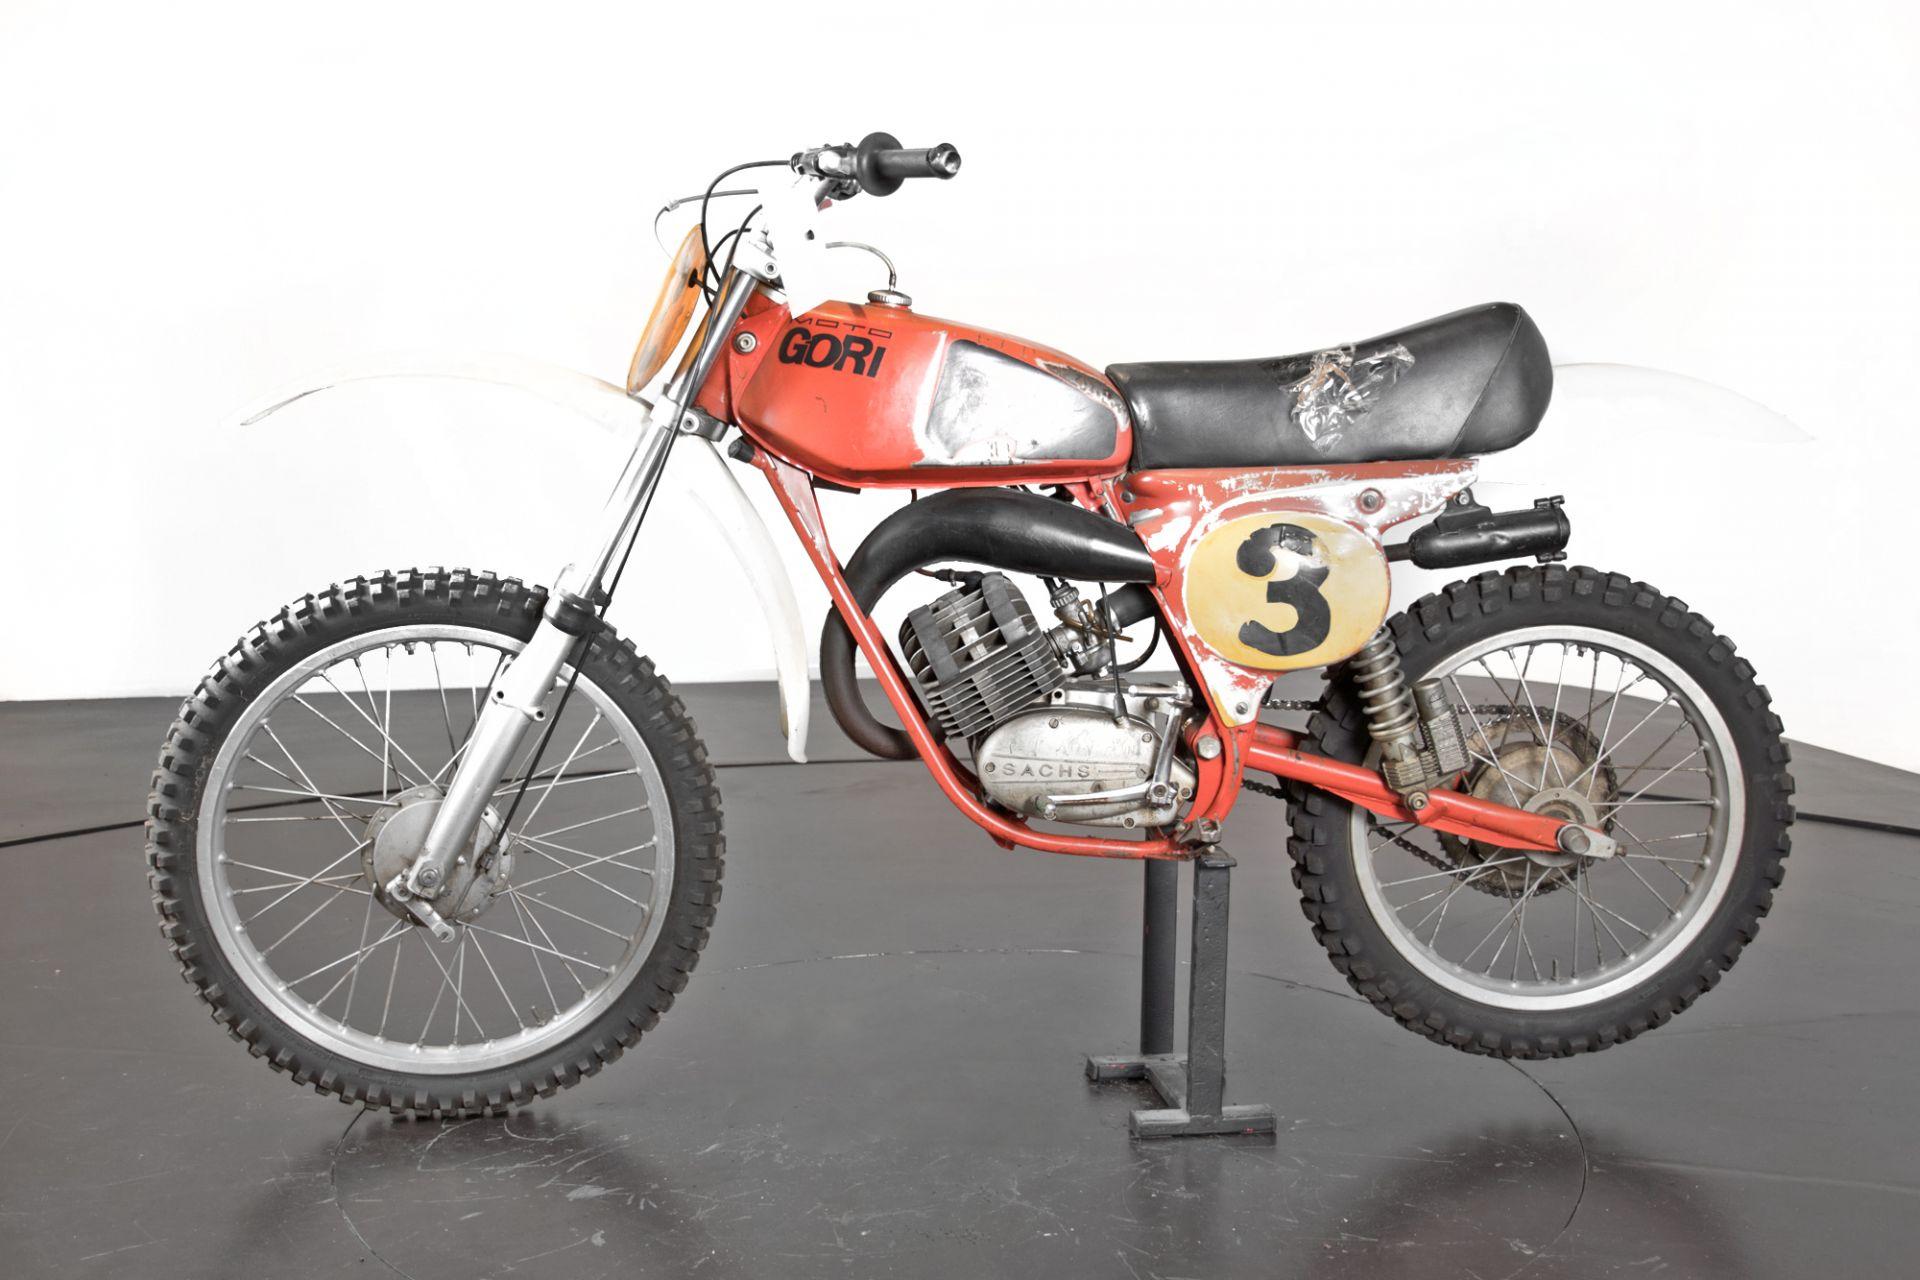 1977 Gori Cross 50 35495